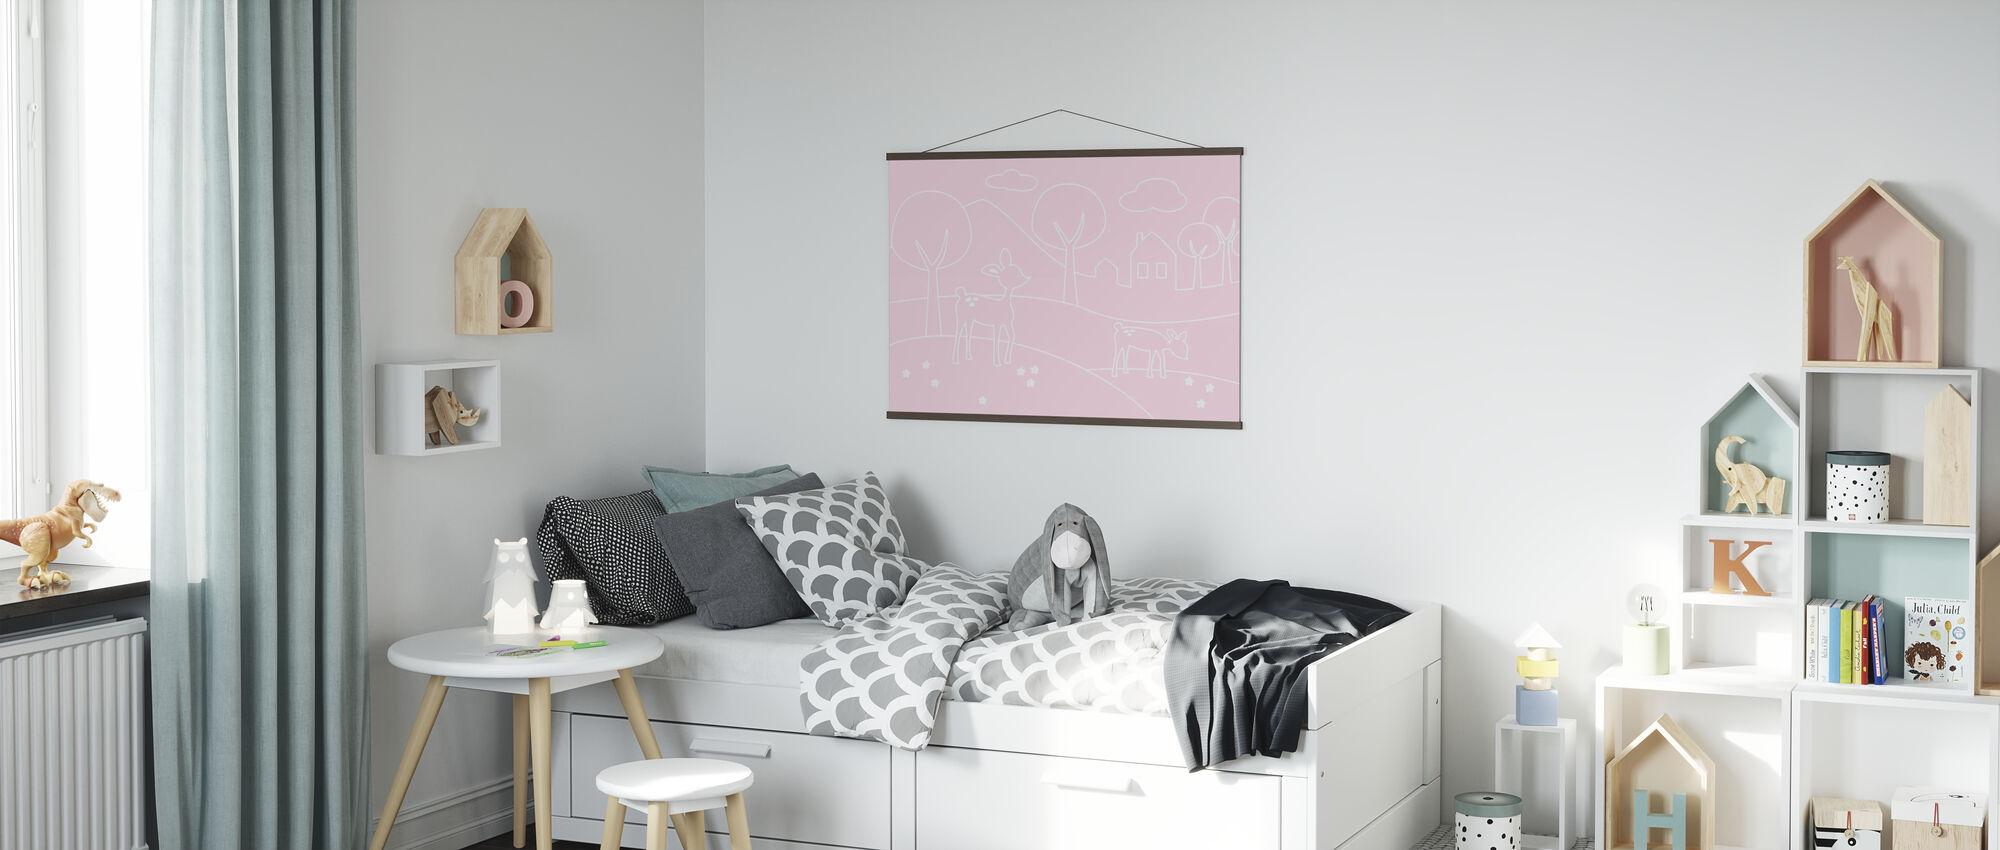 Herten Wereld Lijnen - roze - Poster - Kinderkamer